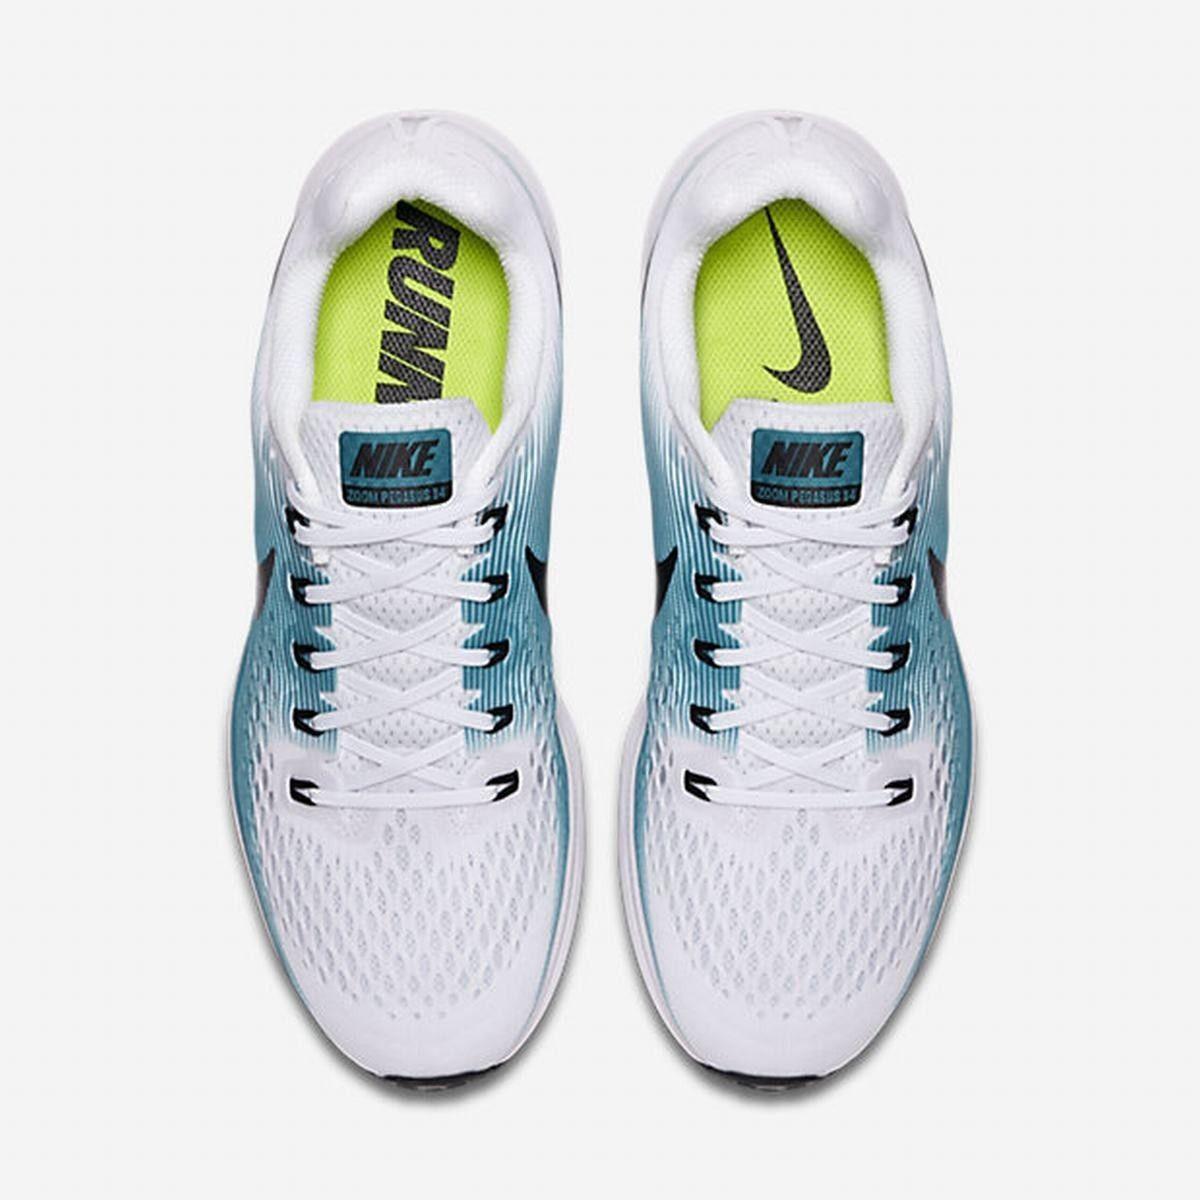 size 40 8ac5a 301f3 New Nike Men s Air Zoom Pegasus 34 Size 7 - white black blue running 880555-